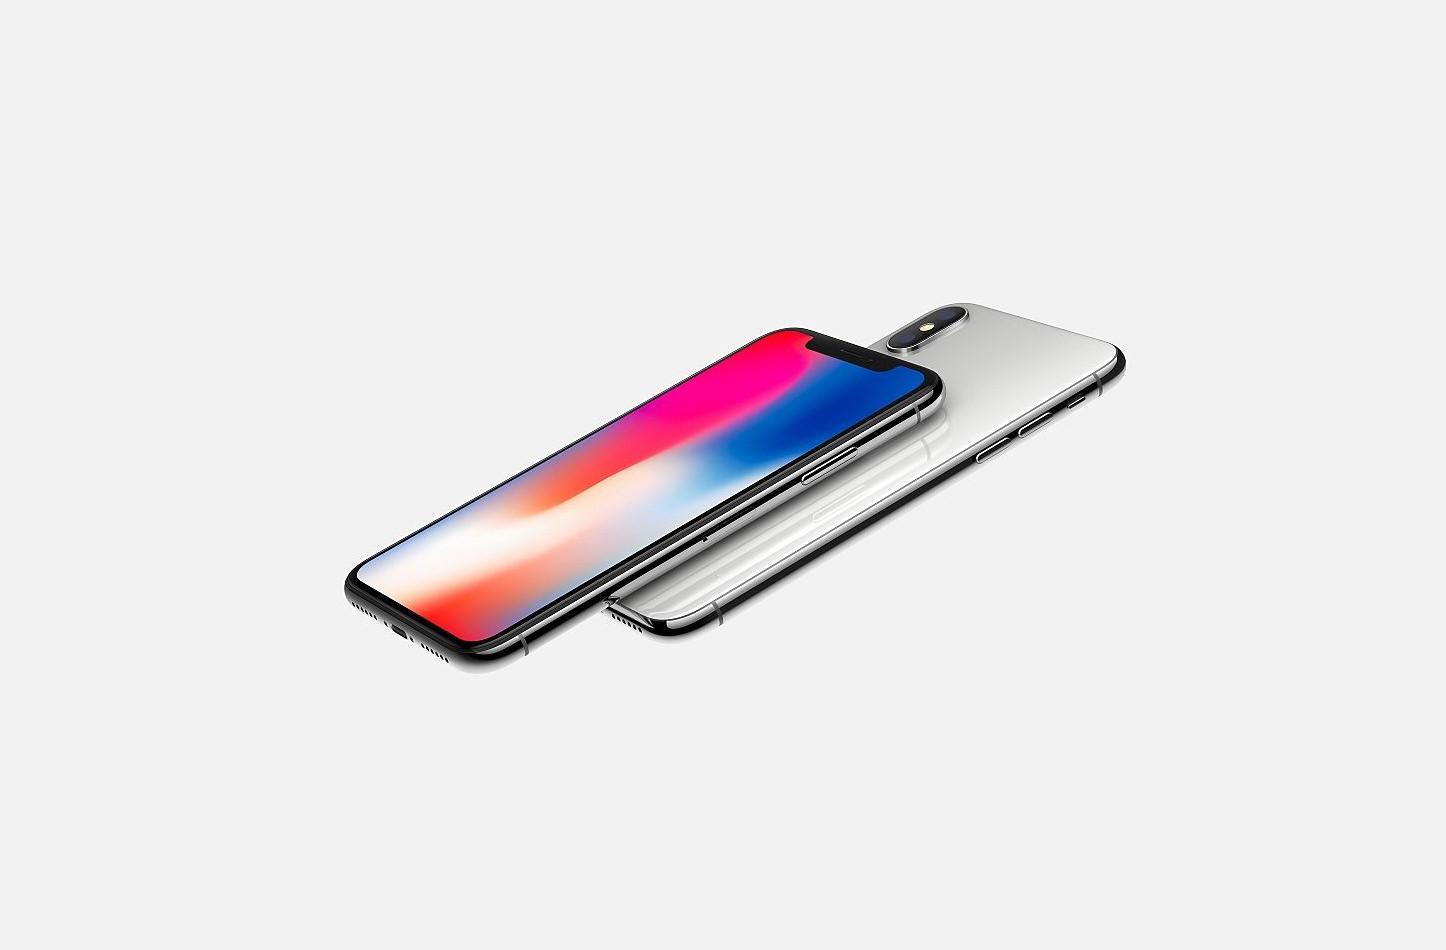 Iphone x diagonal